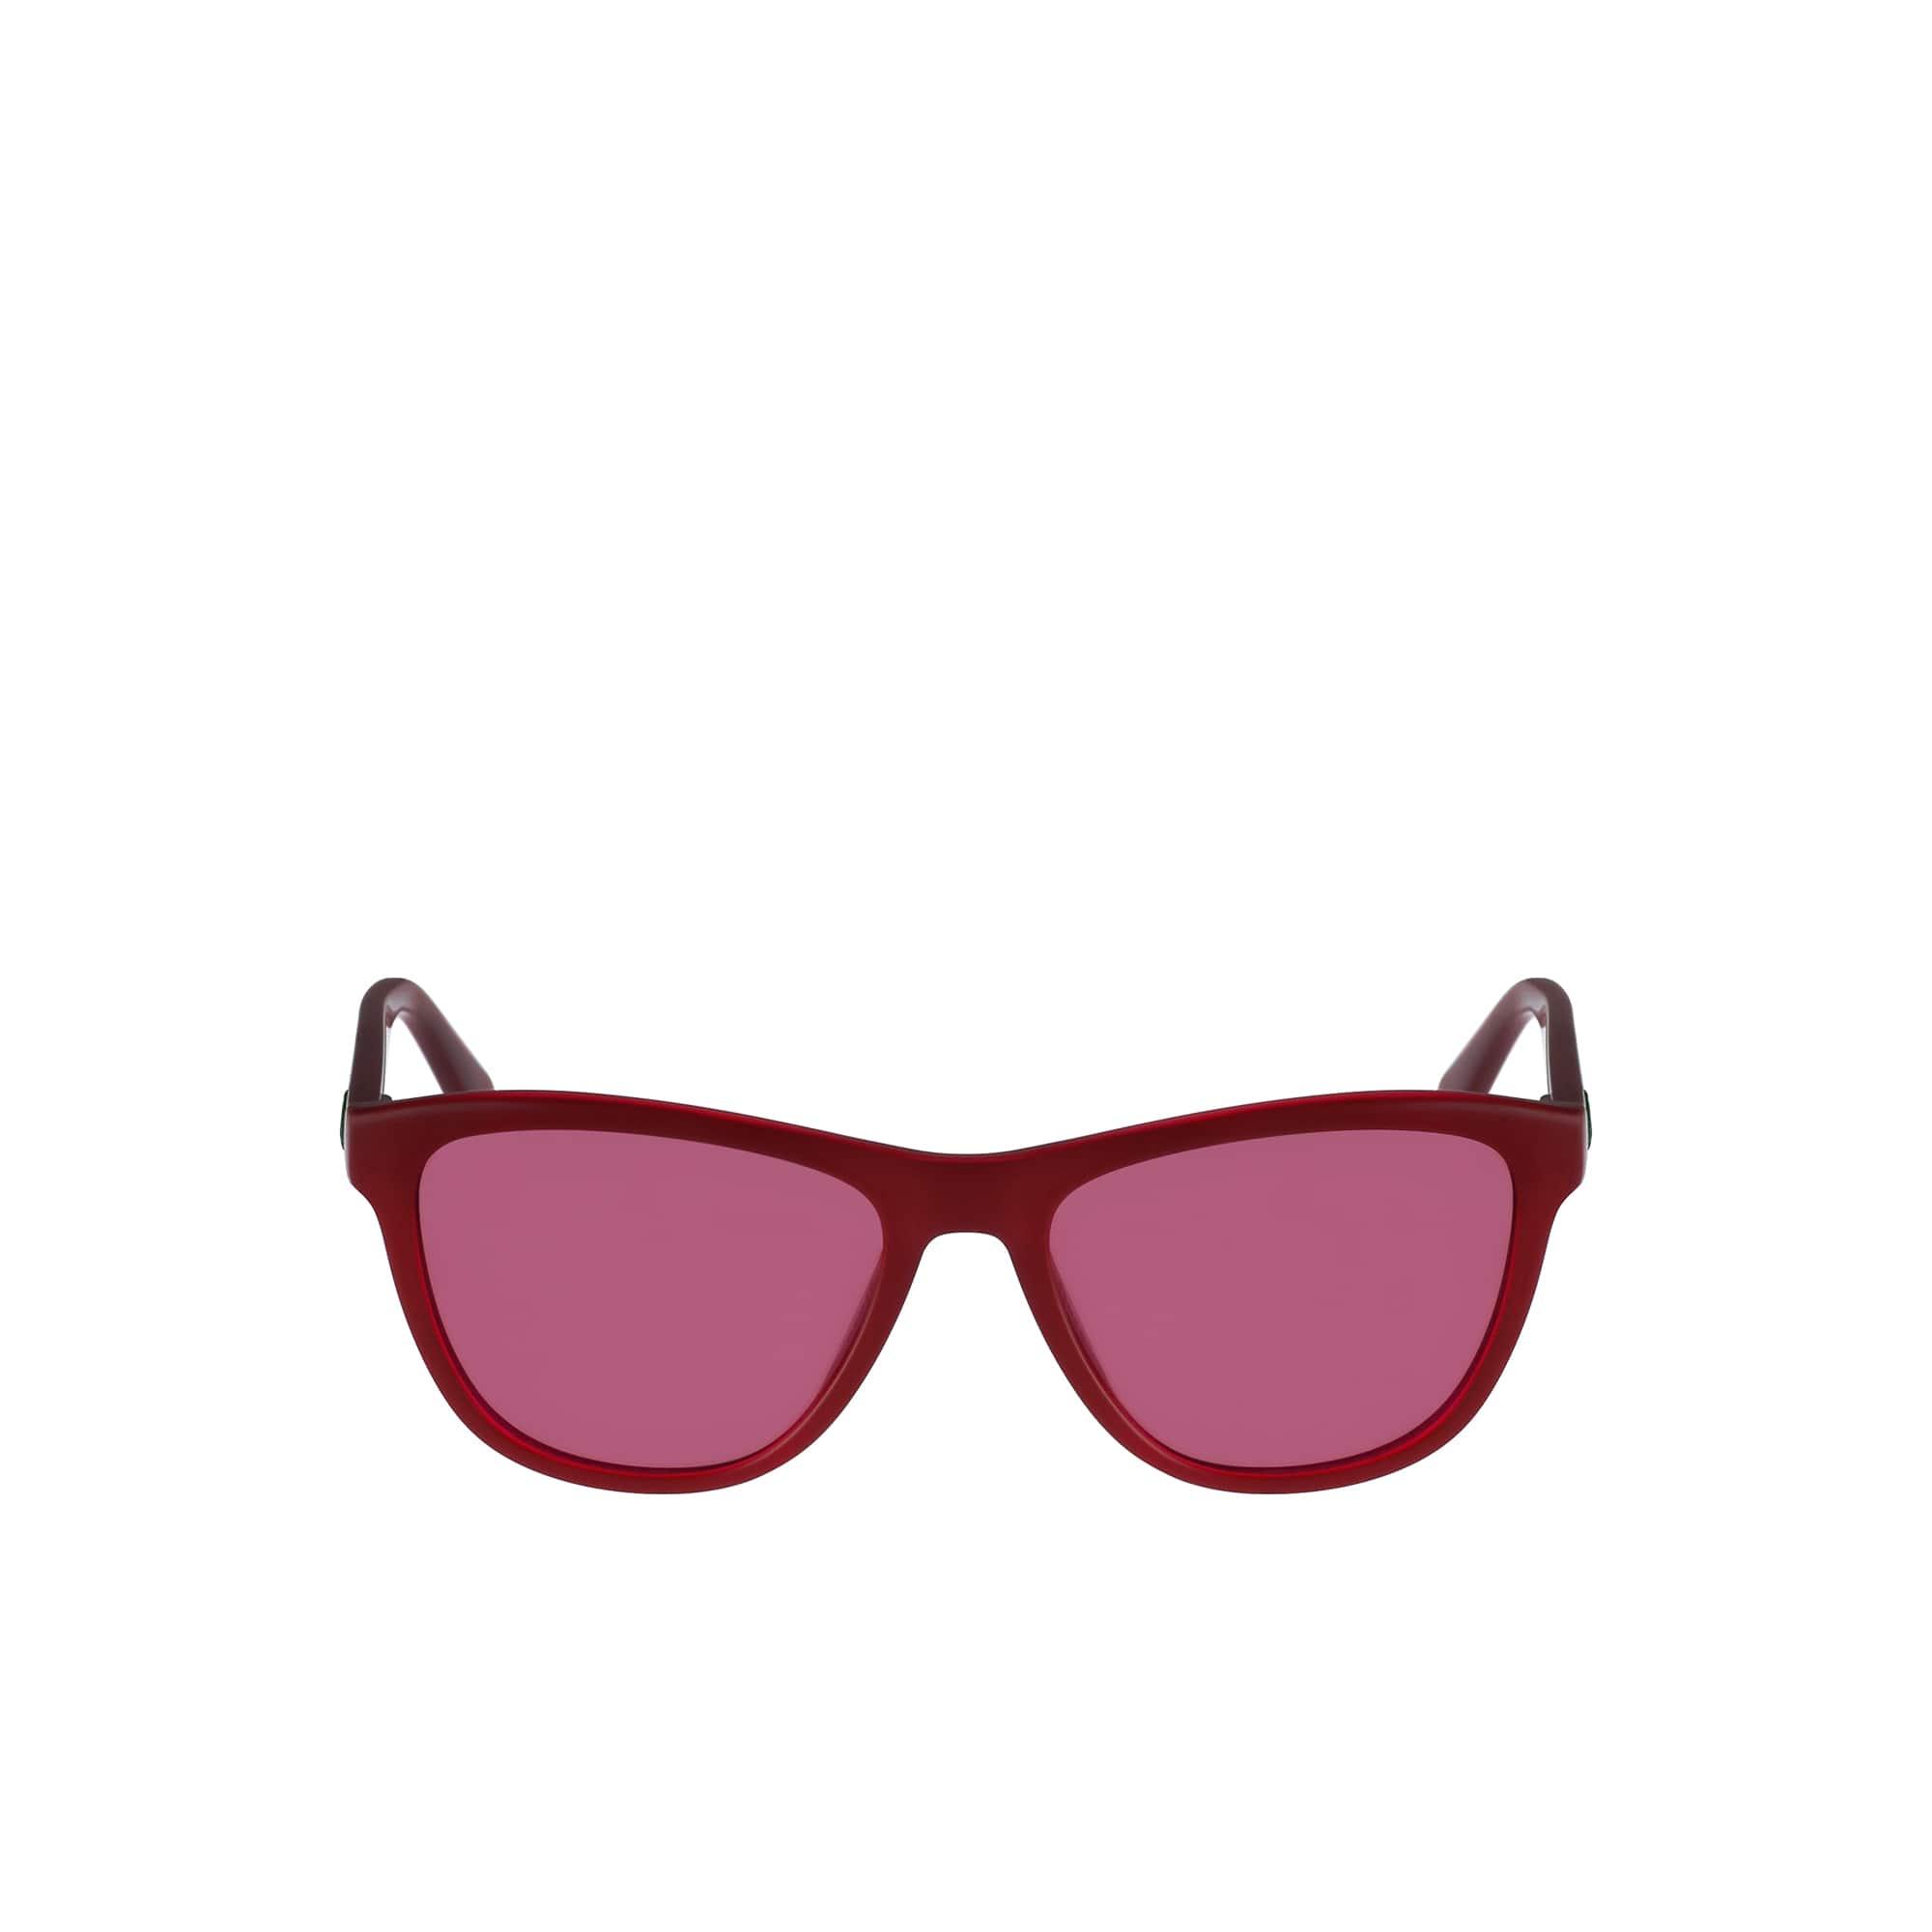 Occhiali da Sole L.12.12 T(w)eens Bambina